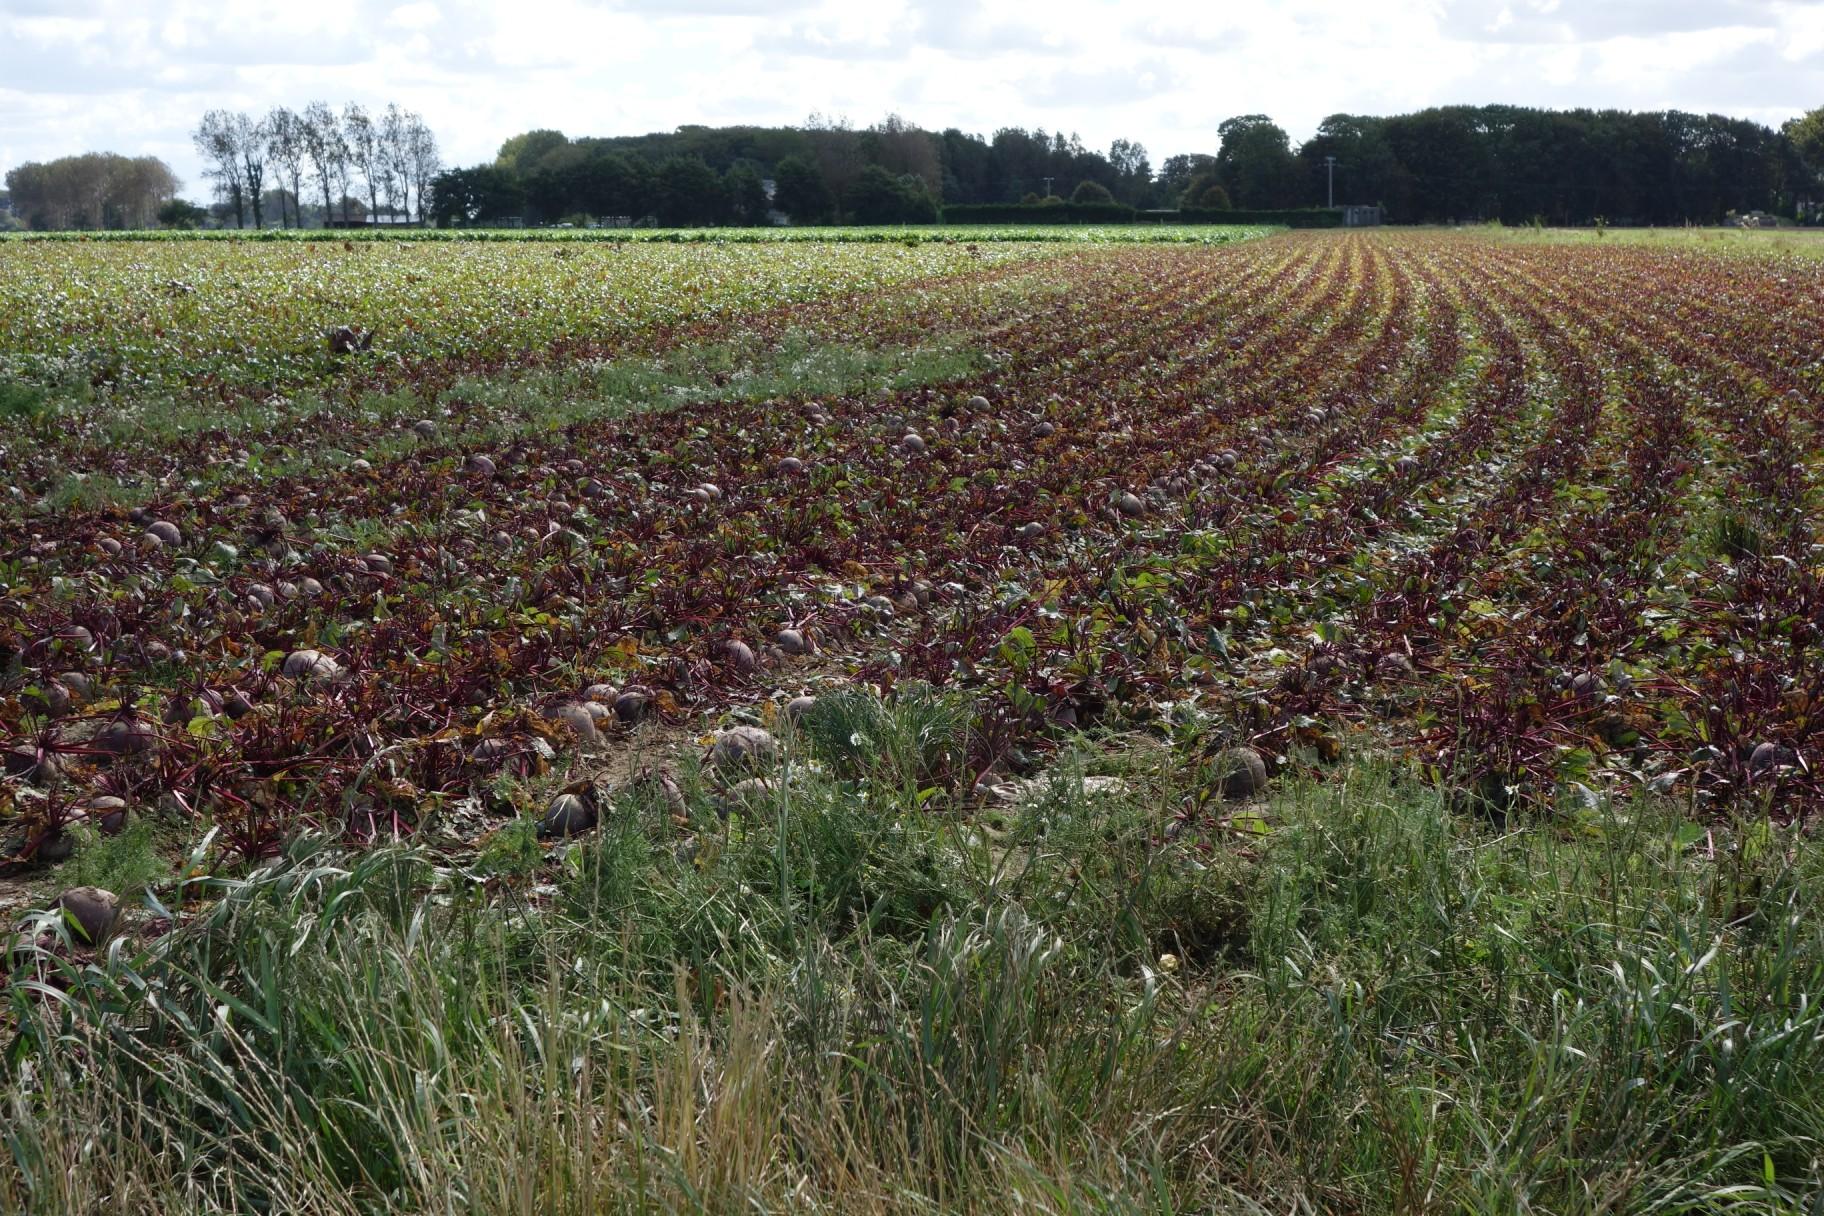 Normandy fields - winter crop emerging